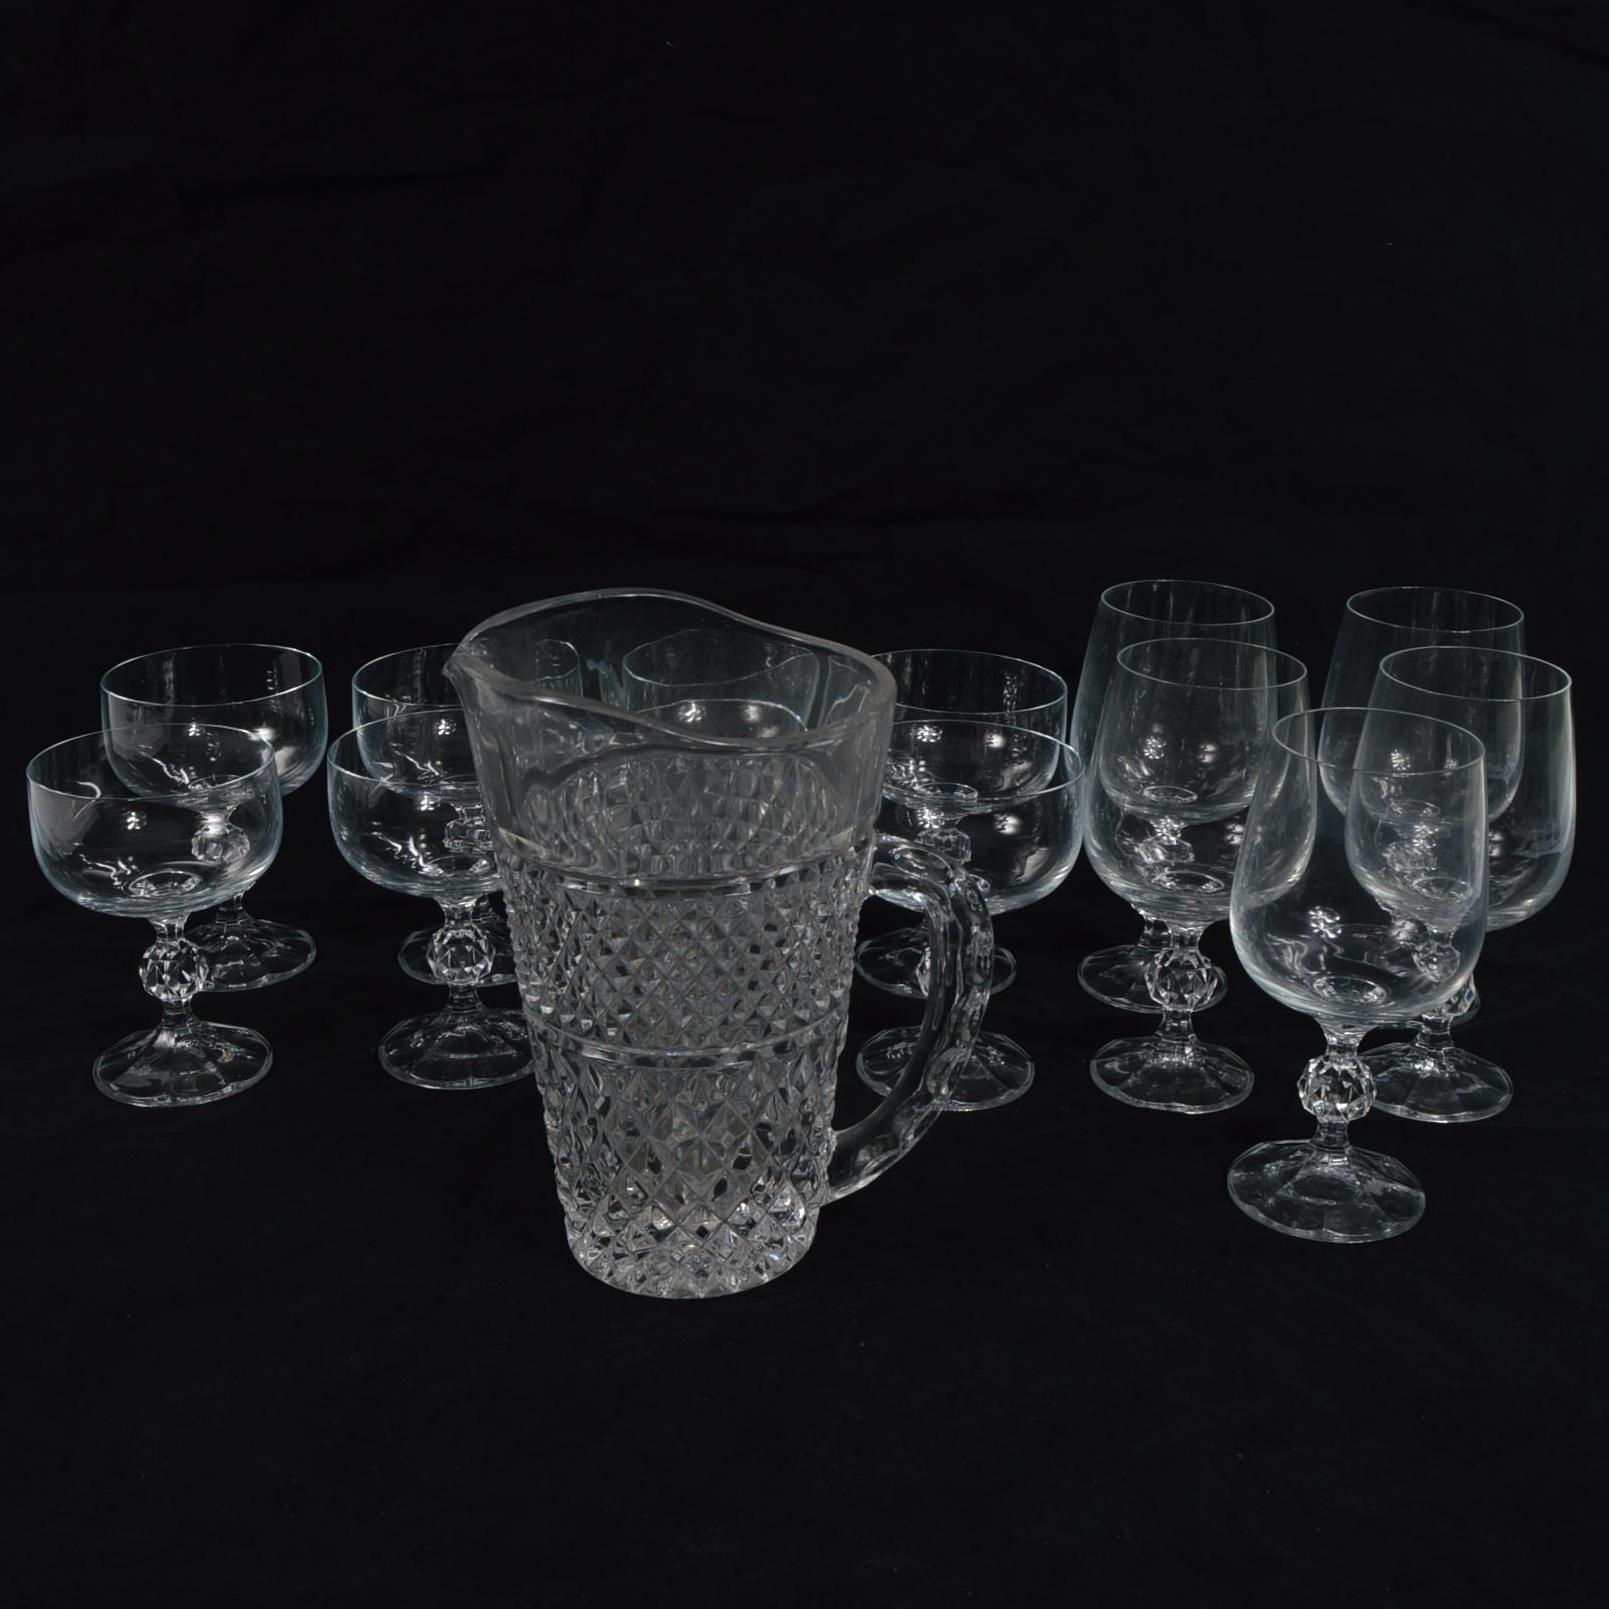 Assortment of Cut Glassware